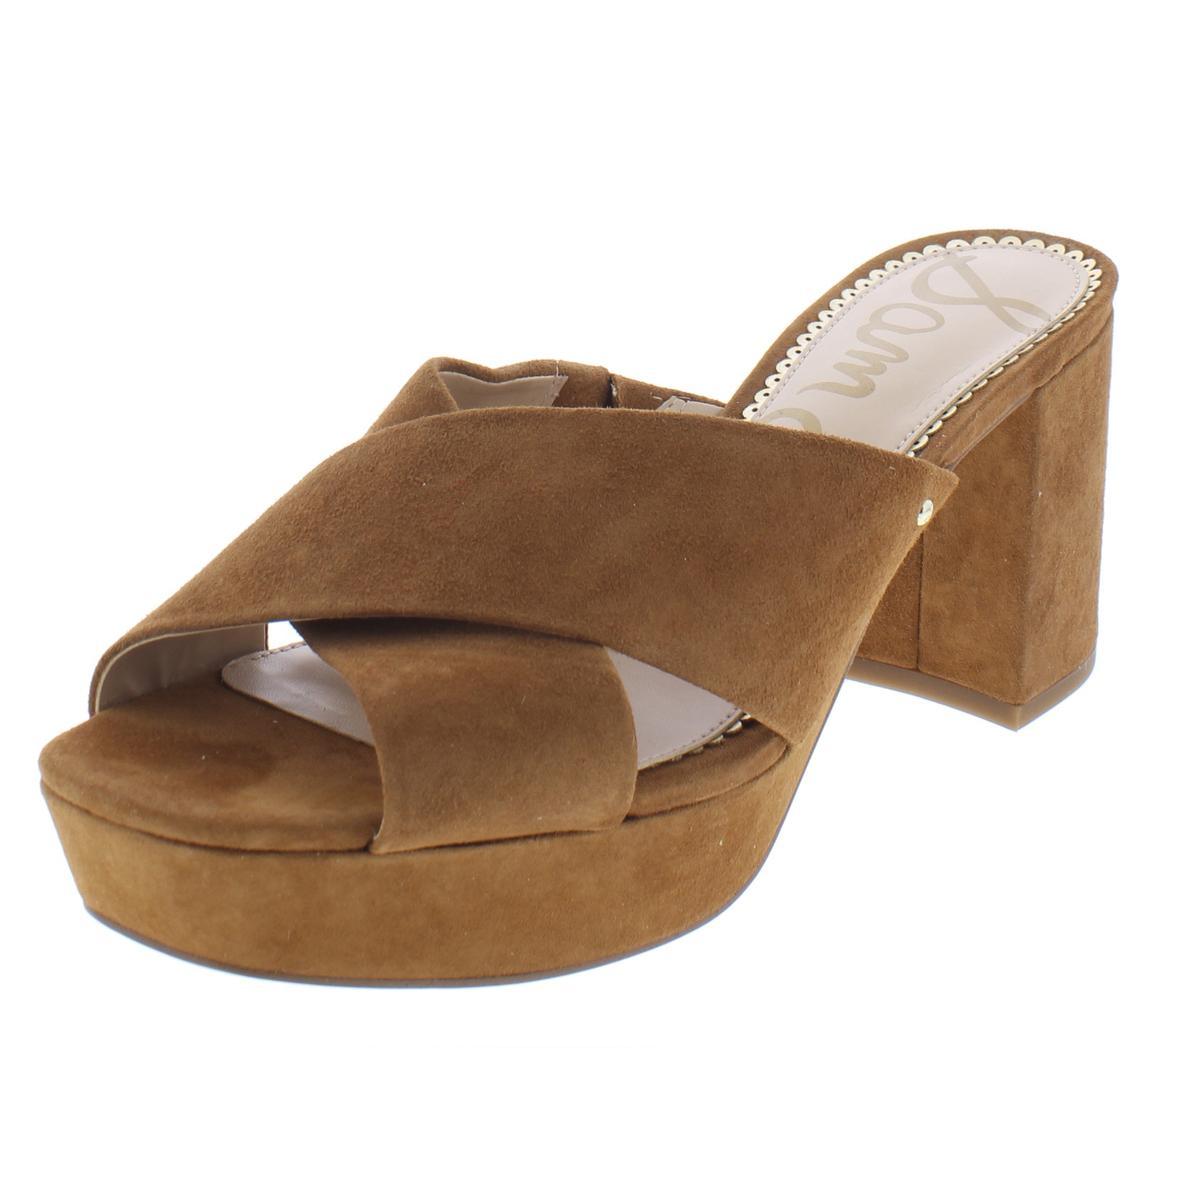 c44f6e82fe21 Details about Sam Edelman Womens Jayne Brown Dress Sandals Evening 7.5  Medium (B